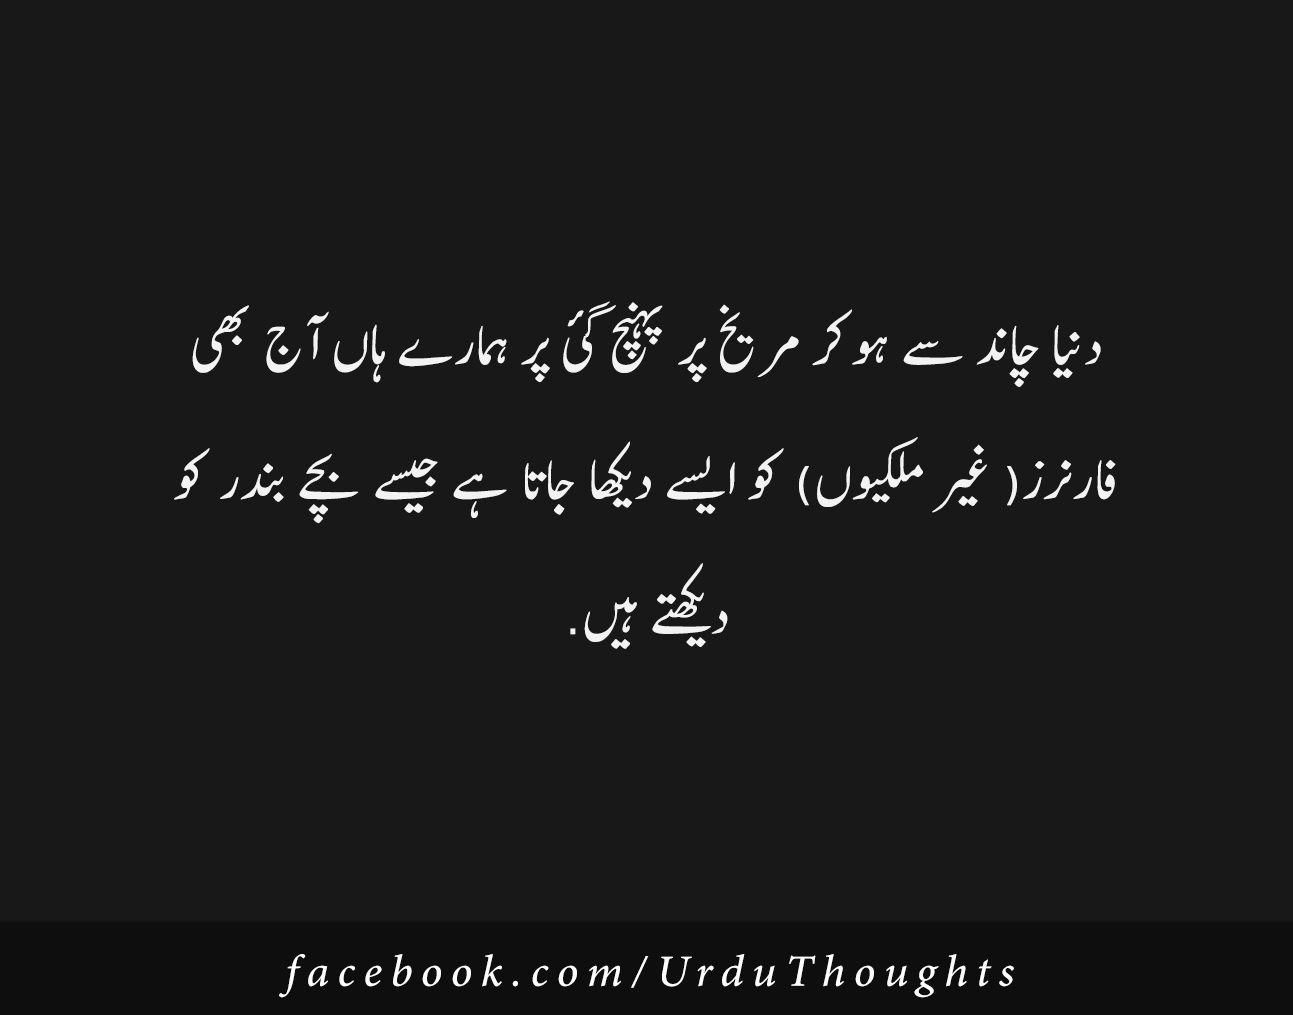 Urdu Funny 2 Line Poetry Mazahiya Shayari Urdu Thoughts Urdu Funny Poetry Funny Jokes Urdu Poetry